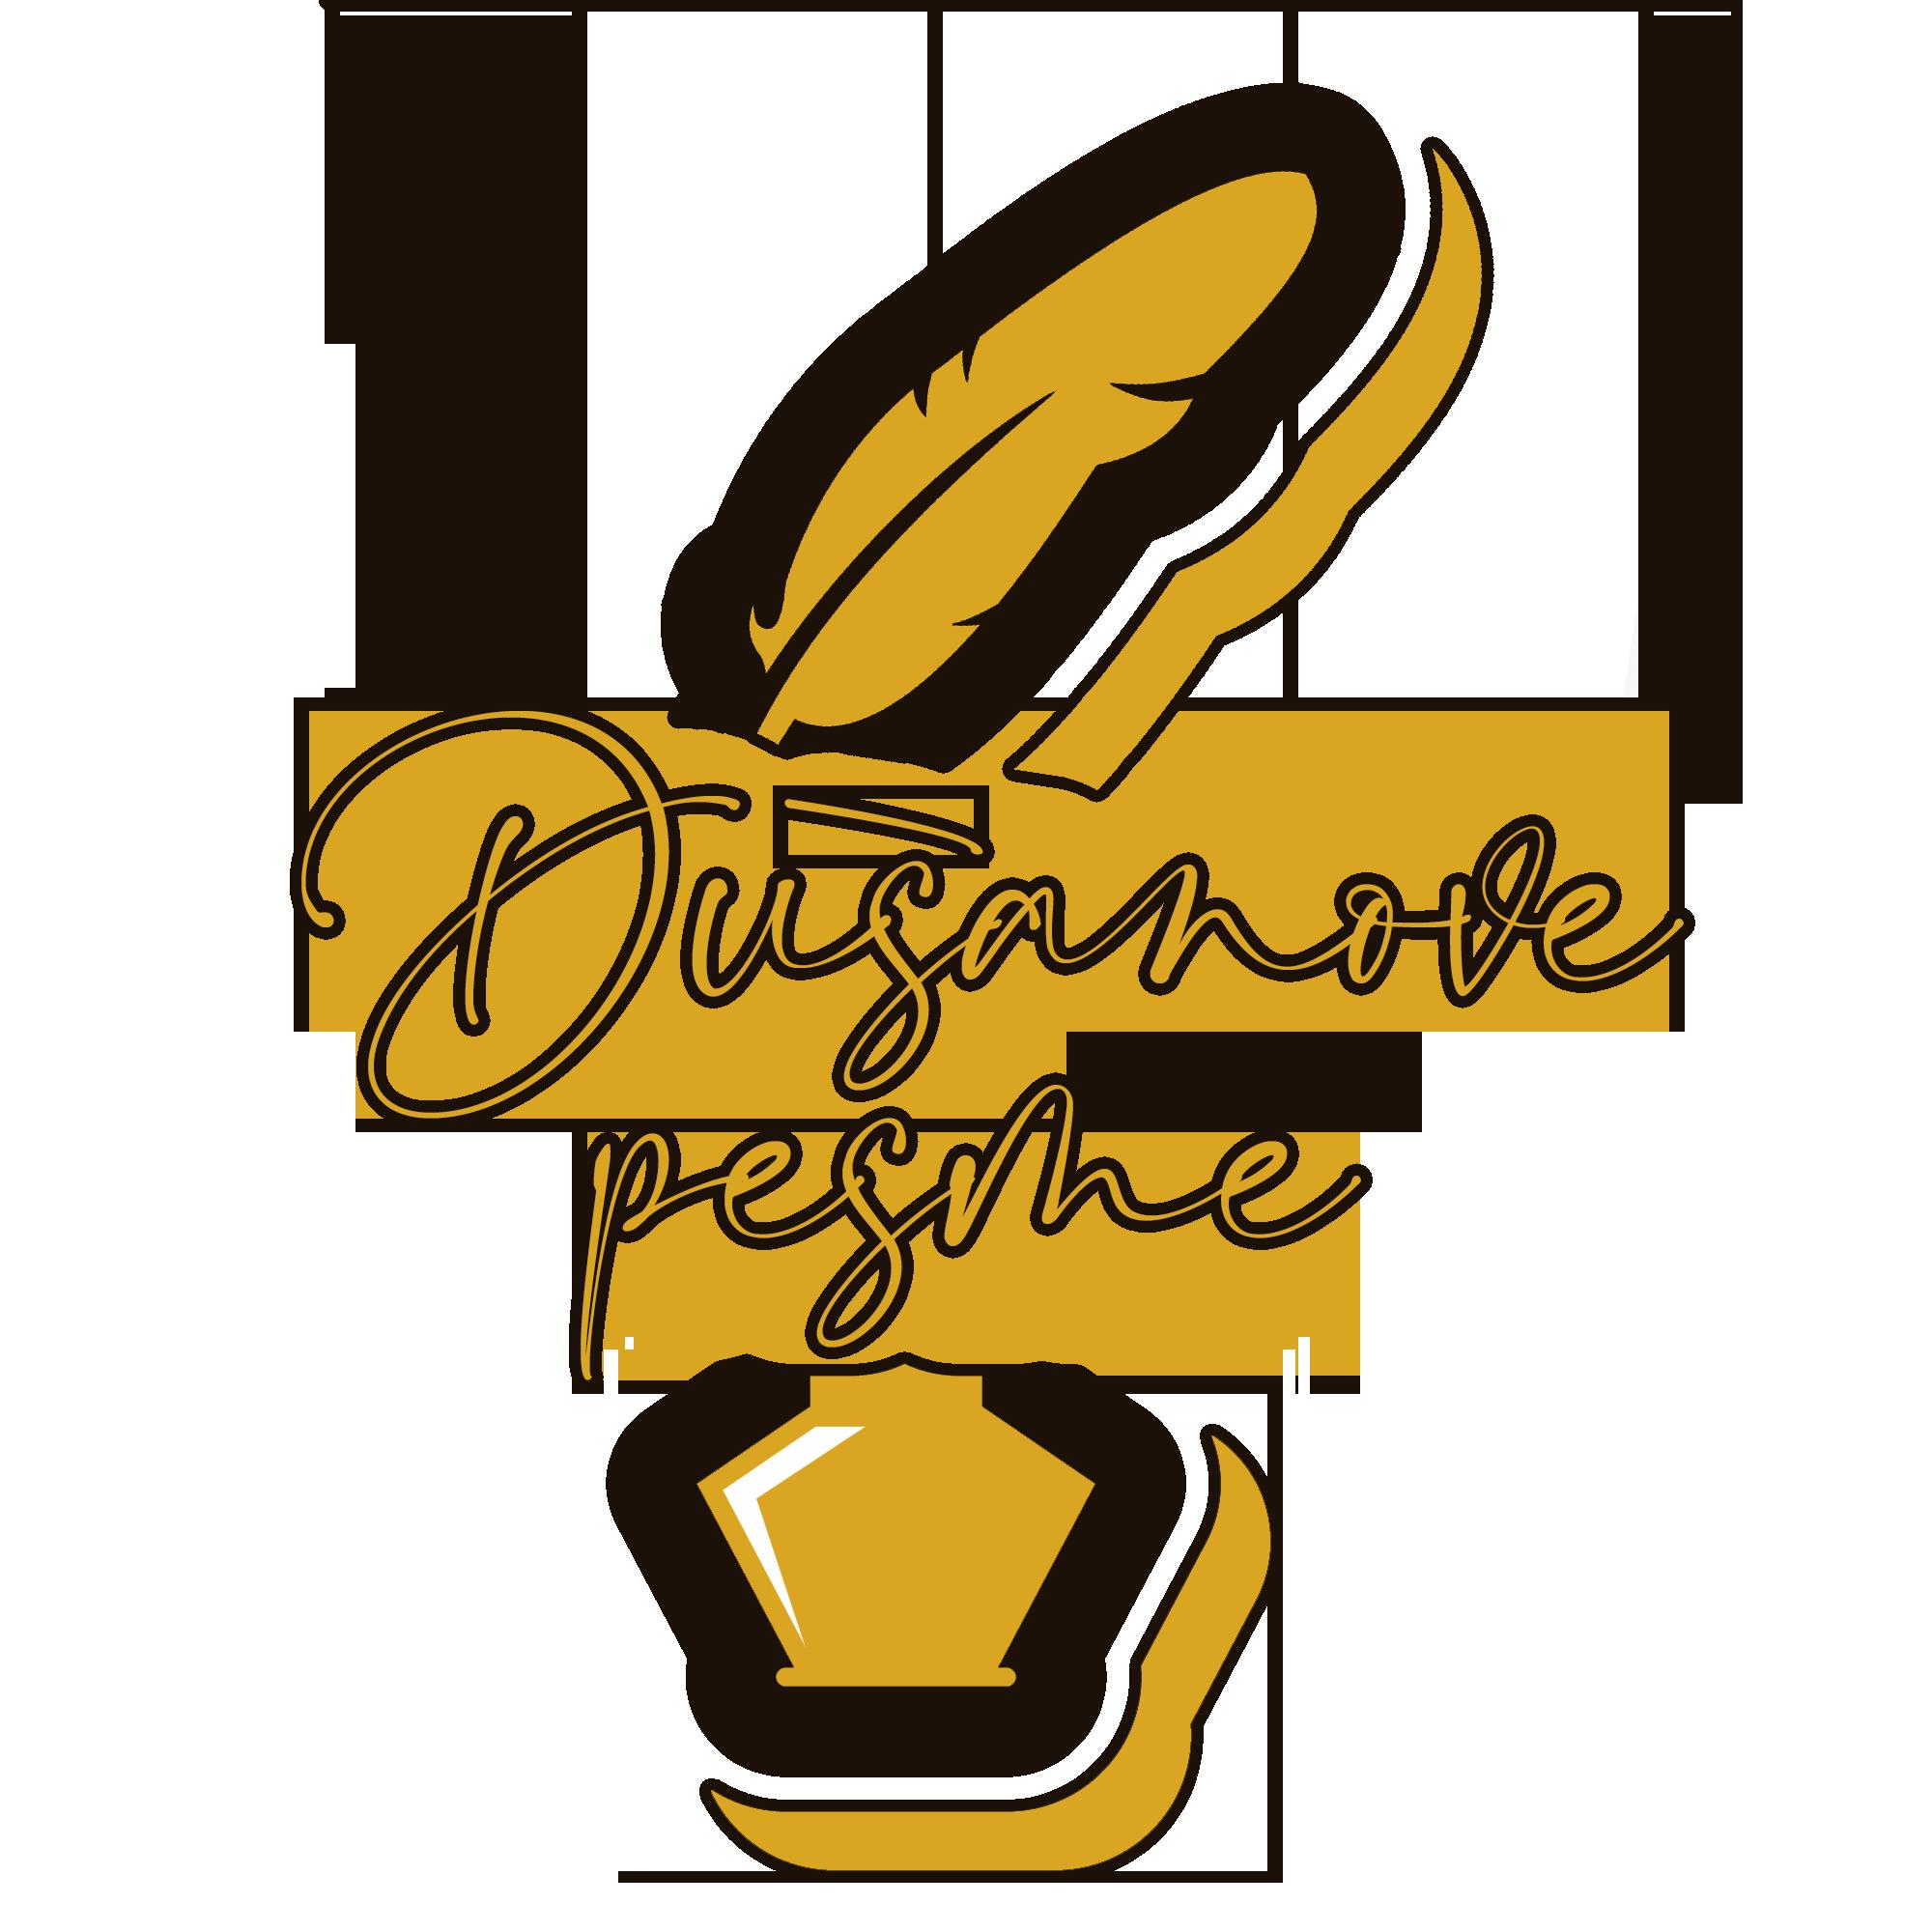 Dušanove pesme Logo